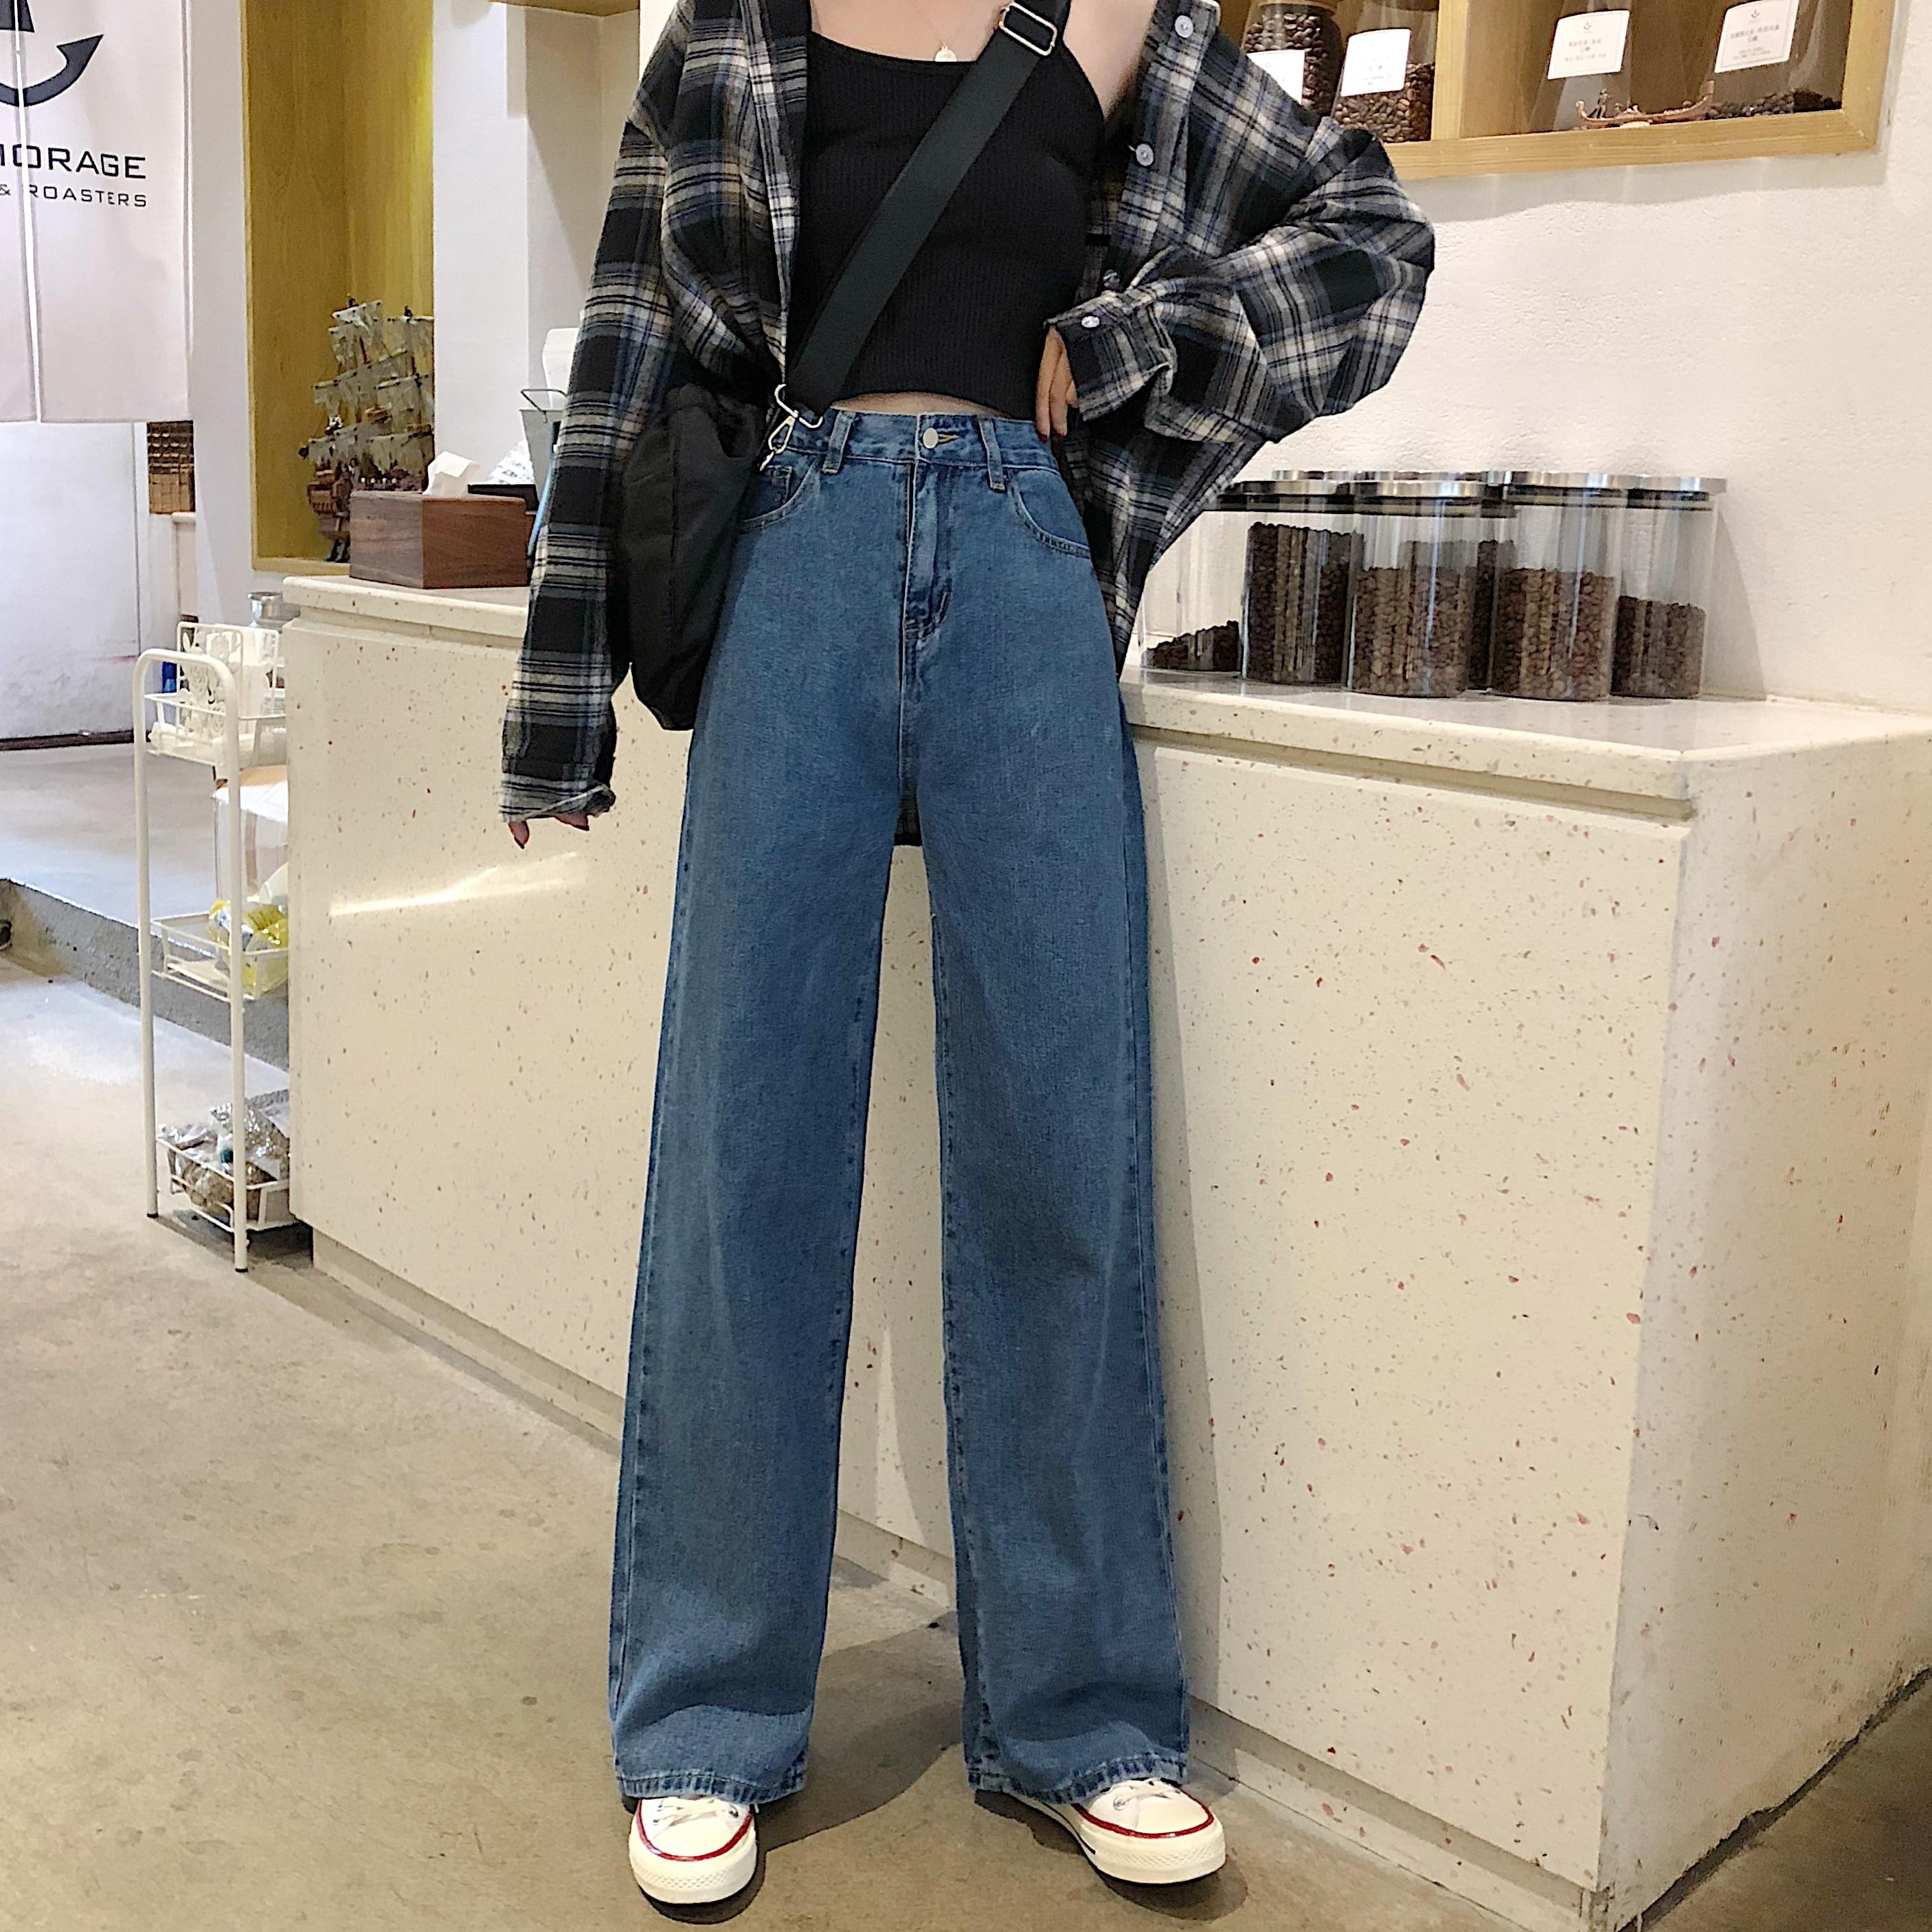 High Waist Jeans For Women Vintage Long Denim Pants Female Vintage Casual Loose Full Length Wide Leg Pants Trousers